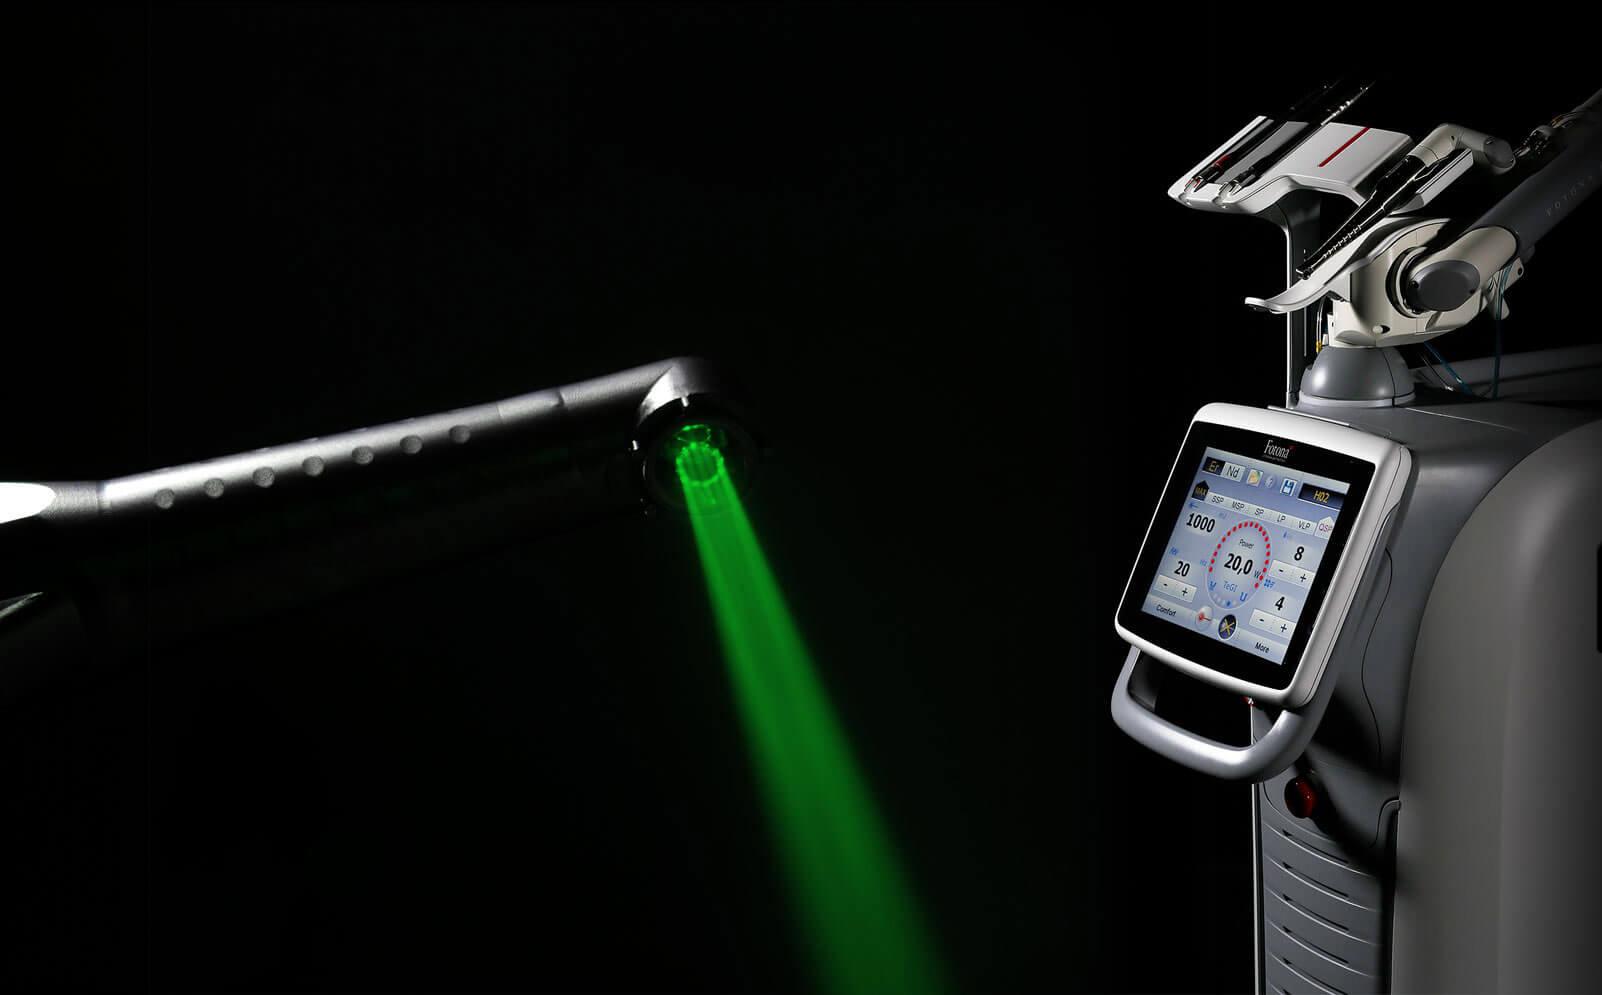 Lightwalker laser